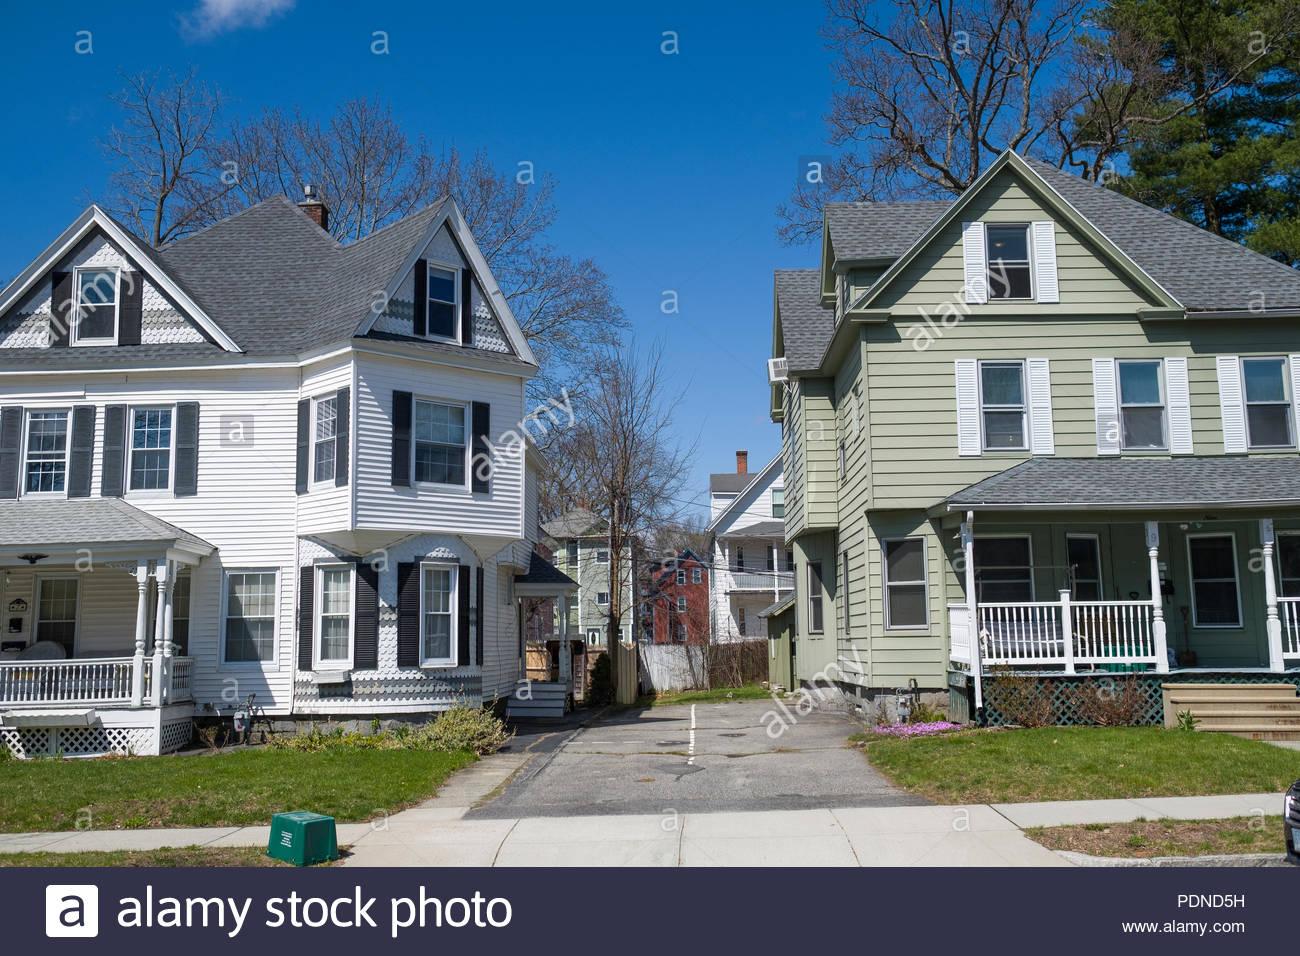 Multistory houses along street in Worcester, Massachusetts, USA - Stock Image